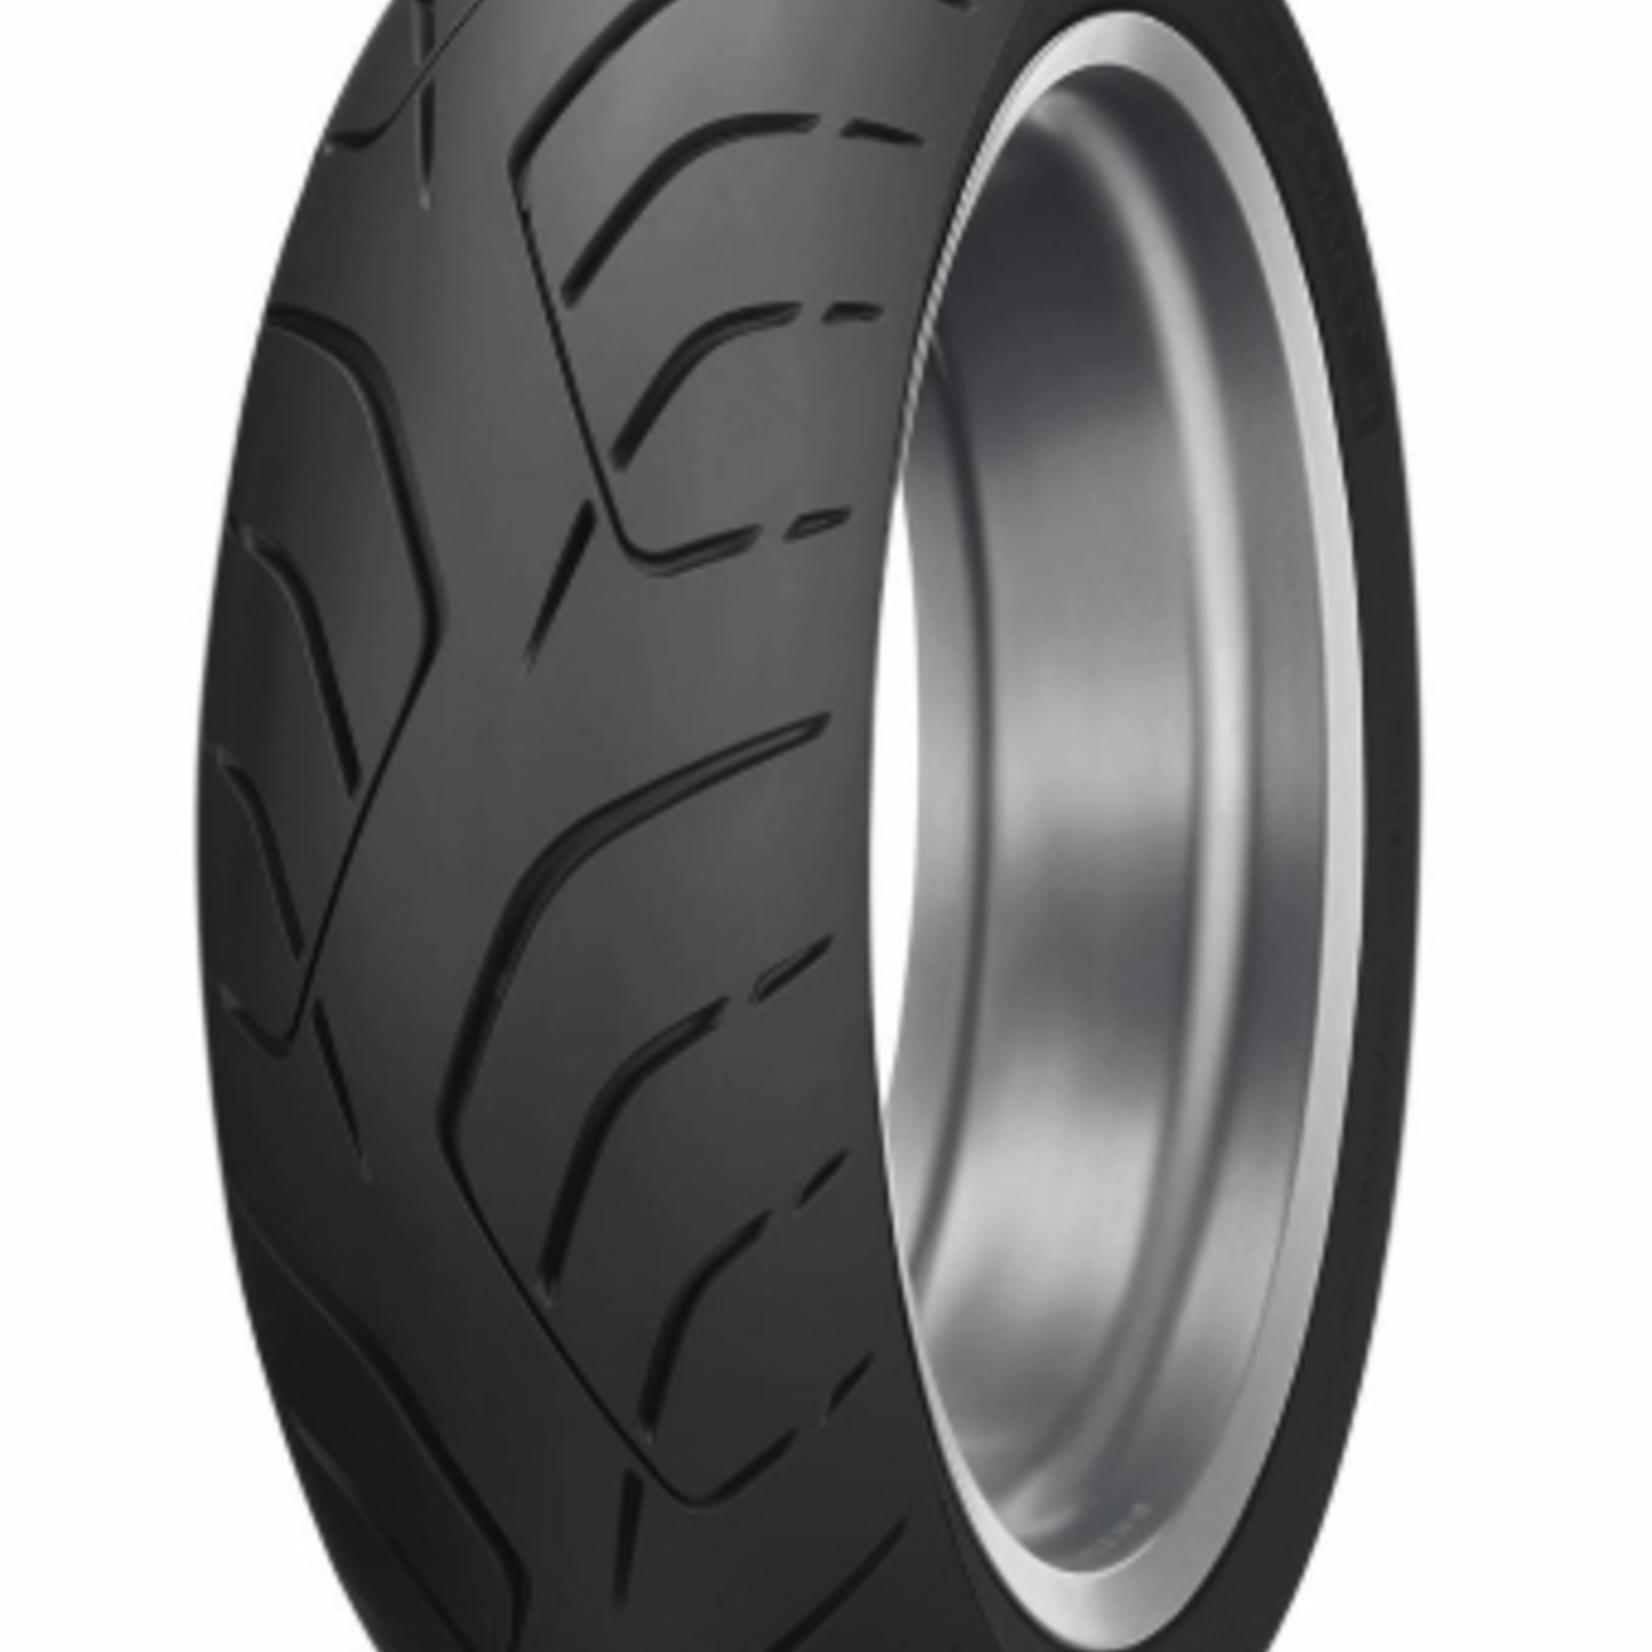 Dunlop Dunlop Roadsmart 3 Rear Tire - 190/50-17